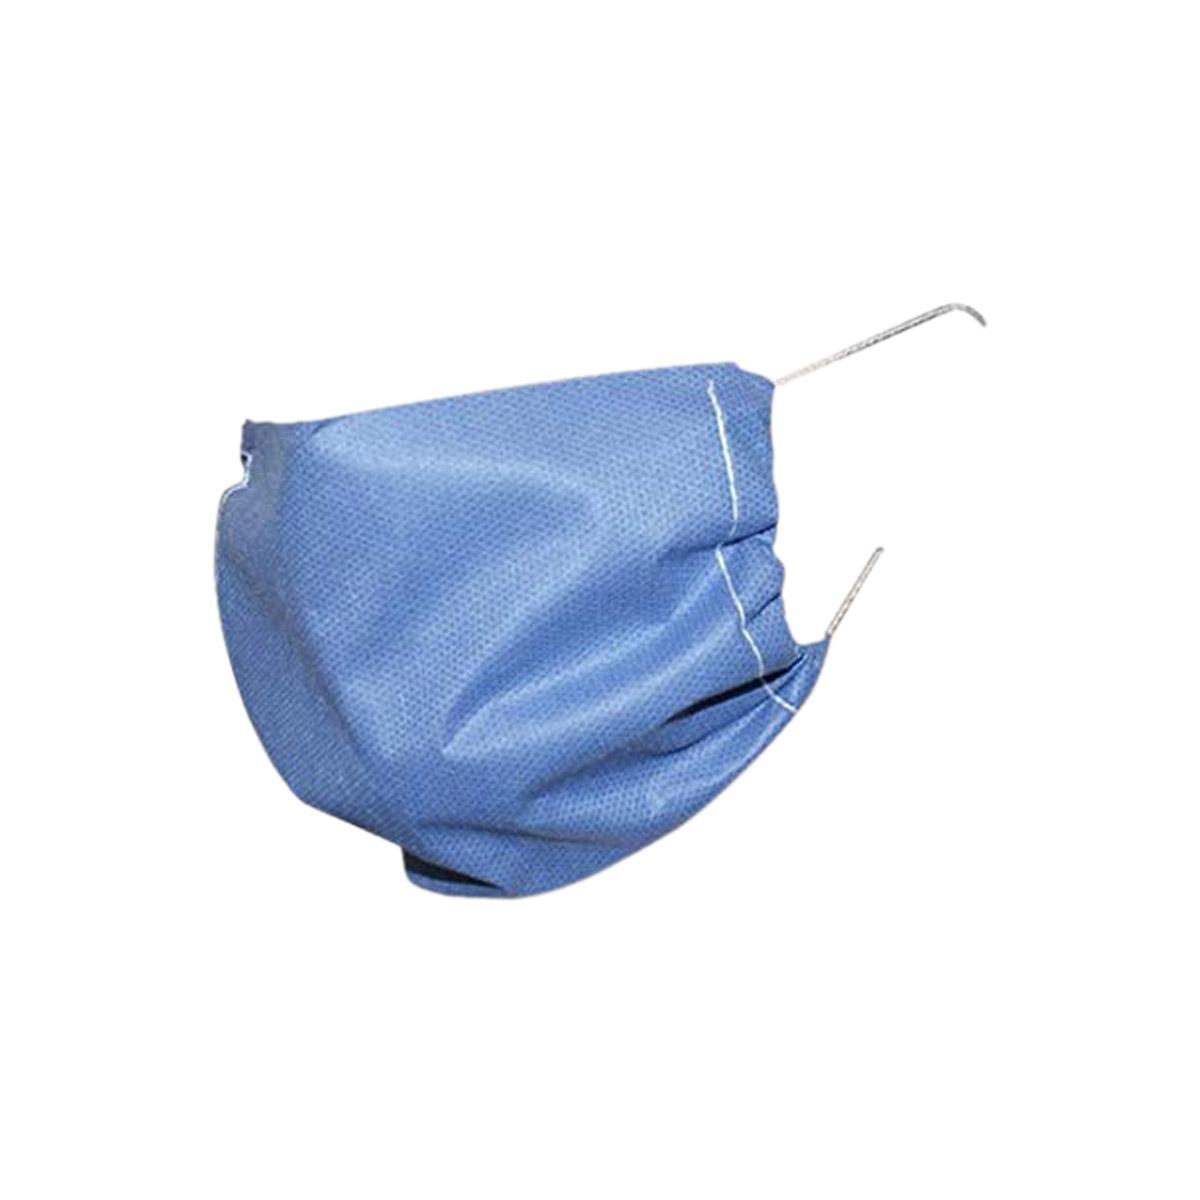 Mascarilla Cubrebocas 2 Capas Azul Prev Coronavirus 100 Pzs